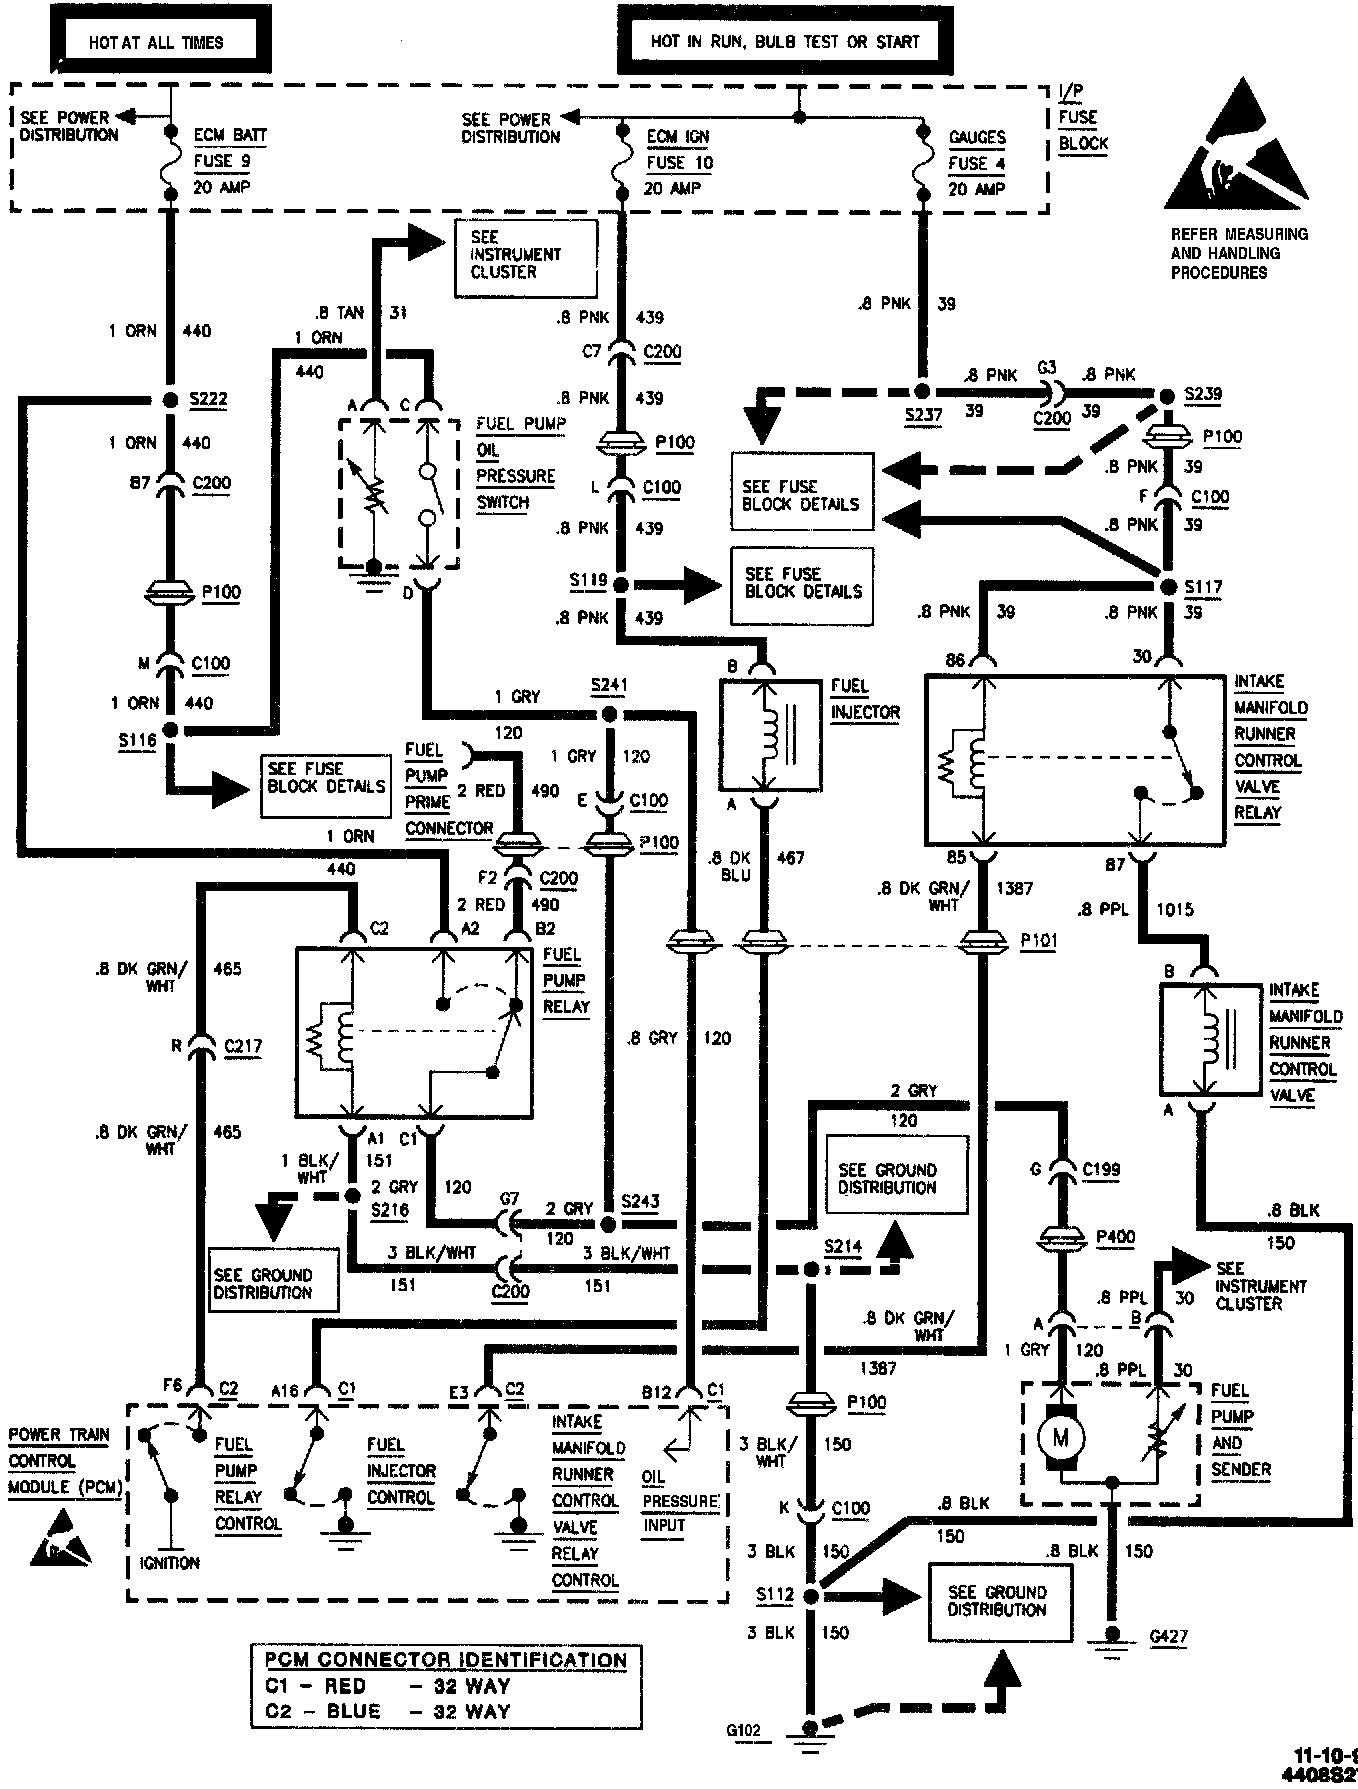 hight resolution of 1995 s10 engine diagram box wiring diagram95 chevy s10 wiring diagram wiring diagrams lol 1995 s10